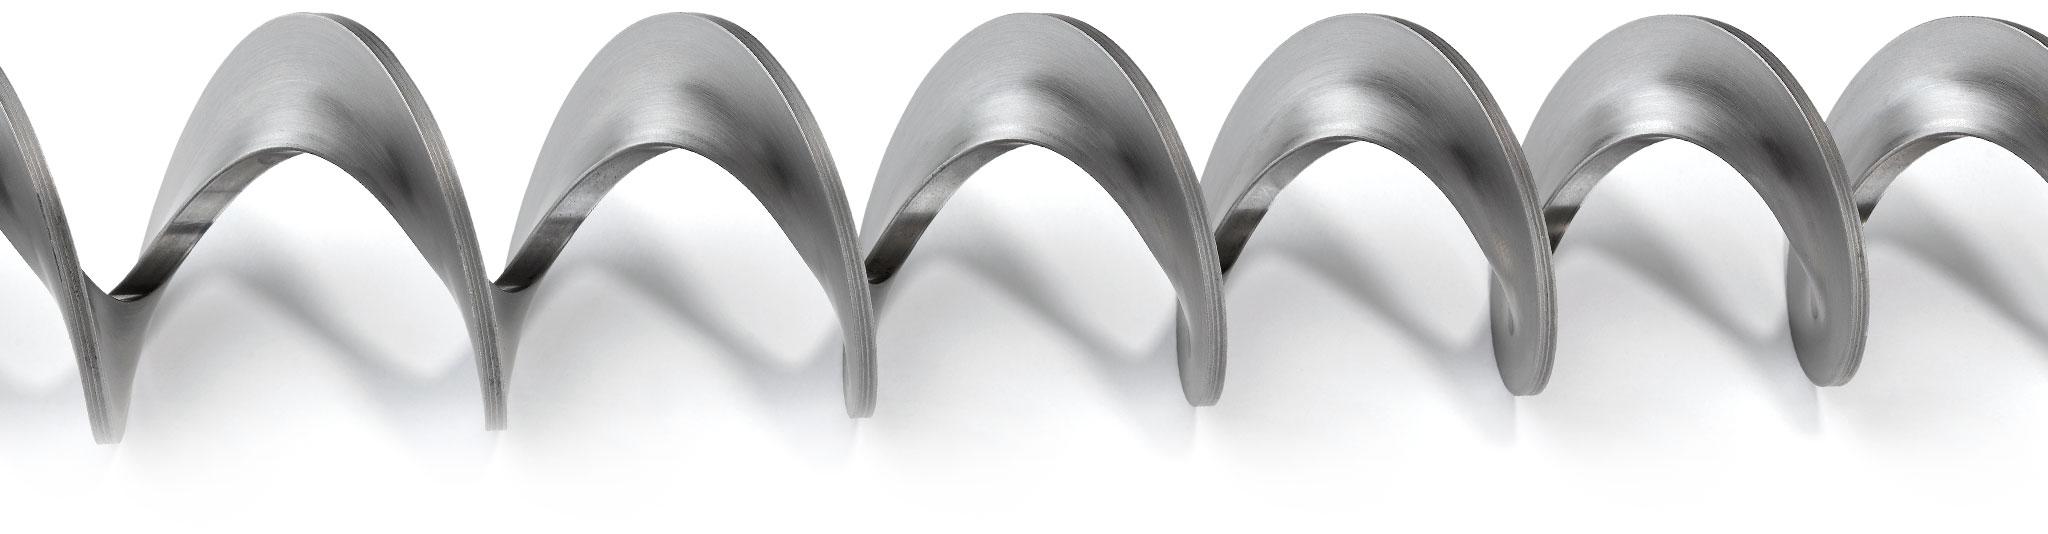 Spirali speciali per stufe e caldaie a pellet e cippato